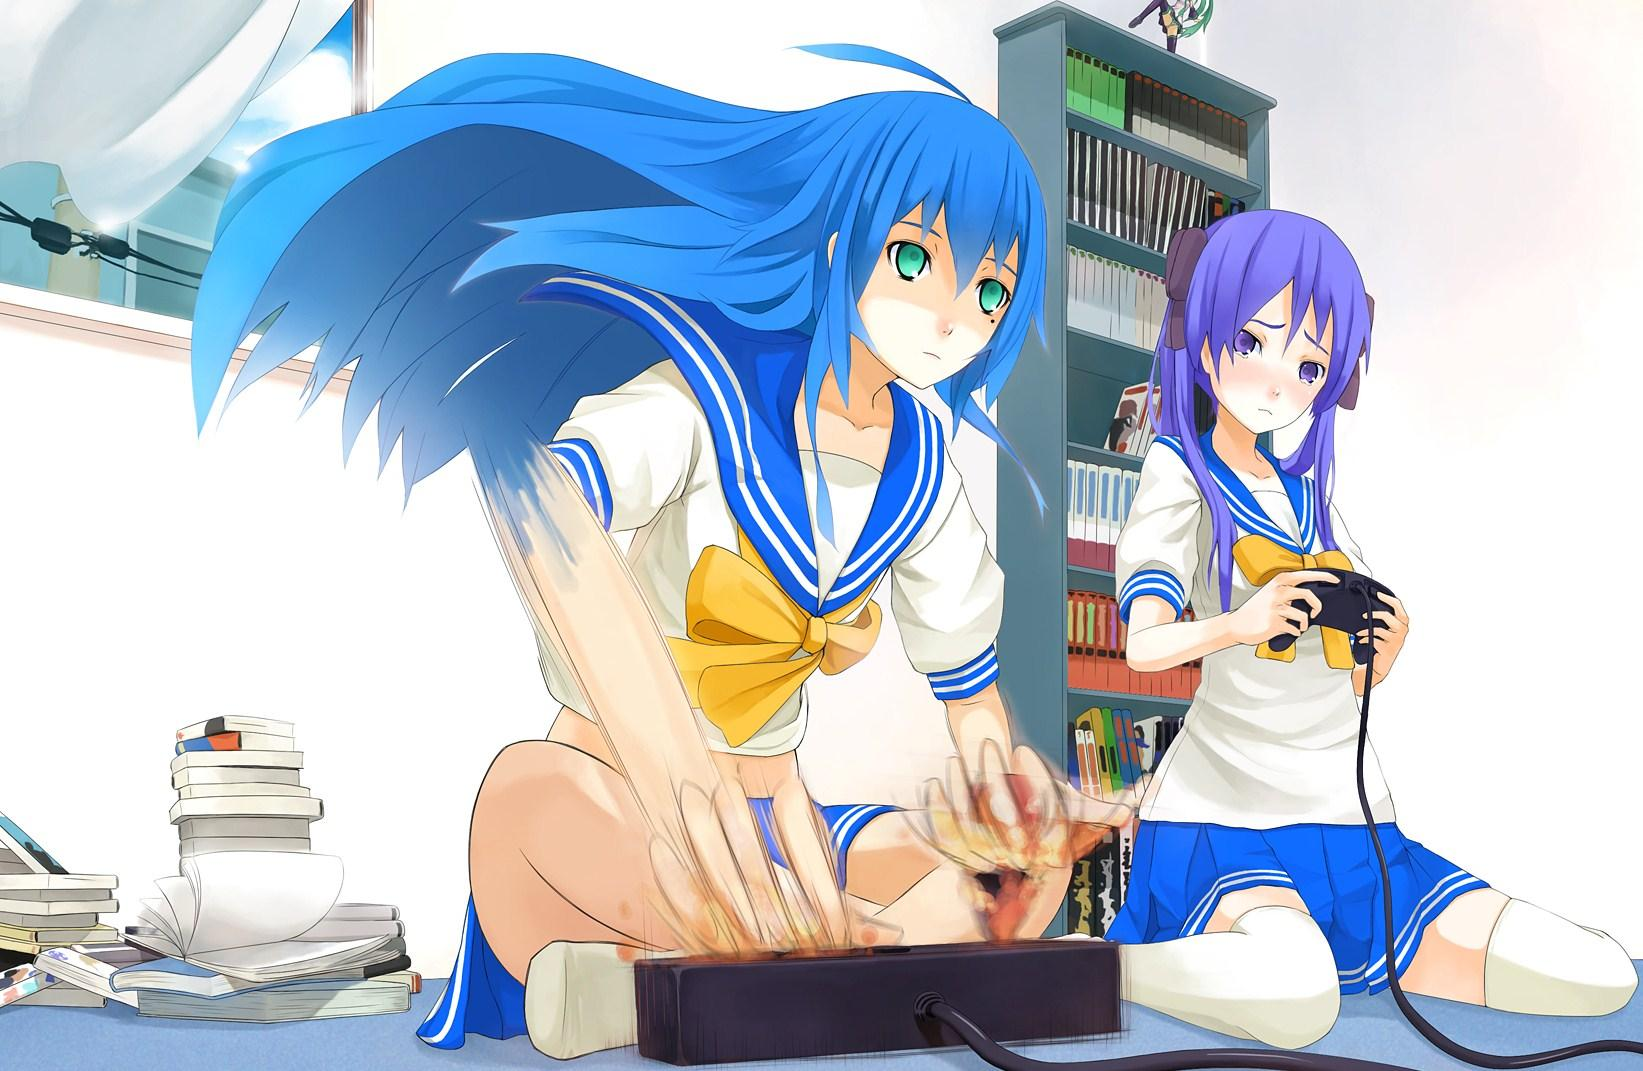 Konata And Kagami Playing Video Games